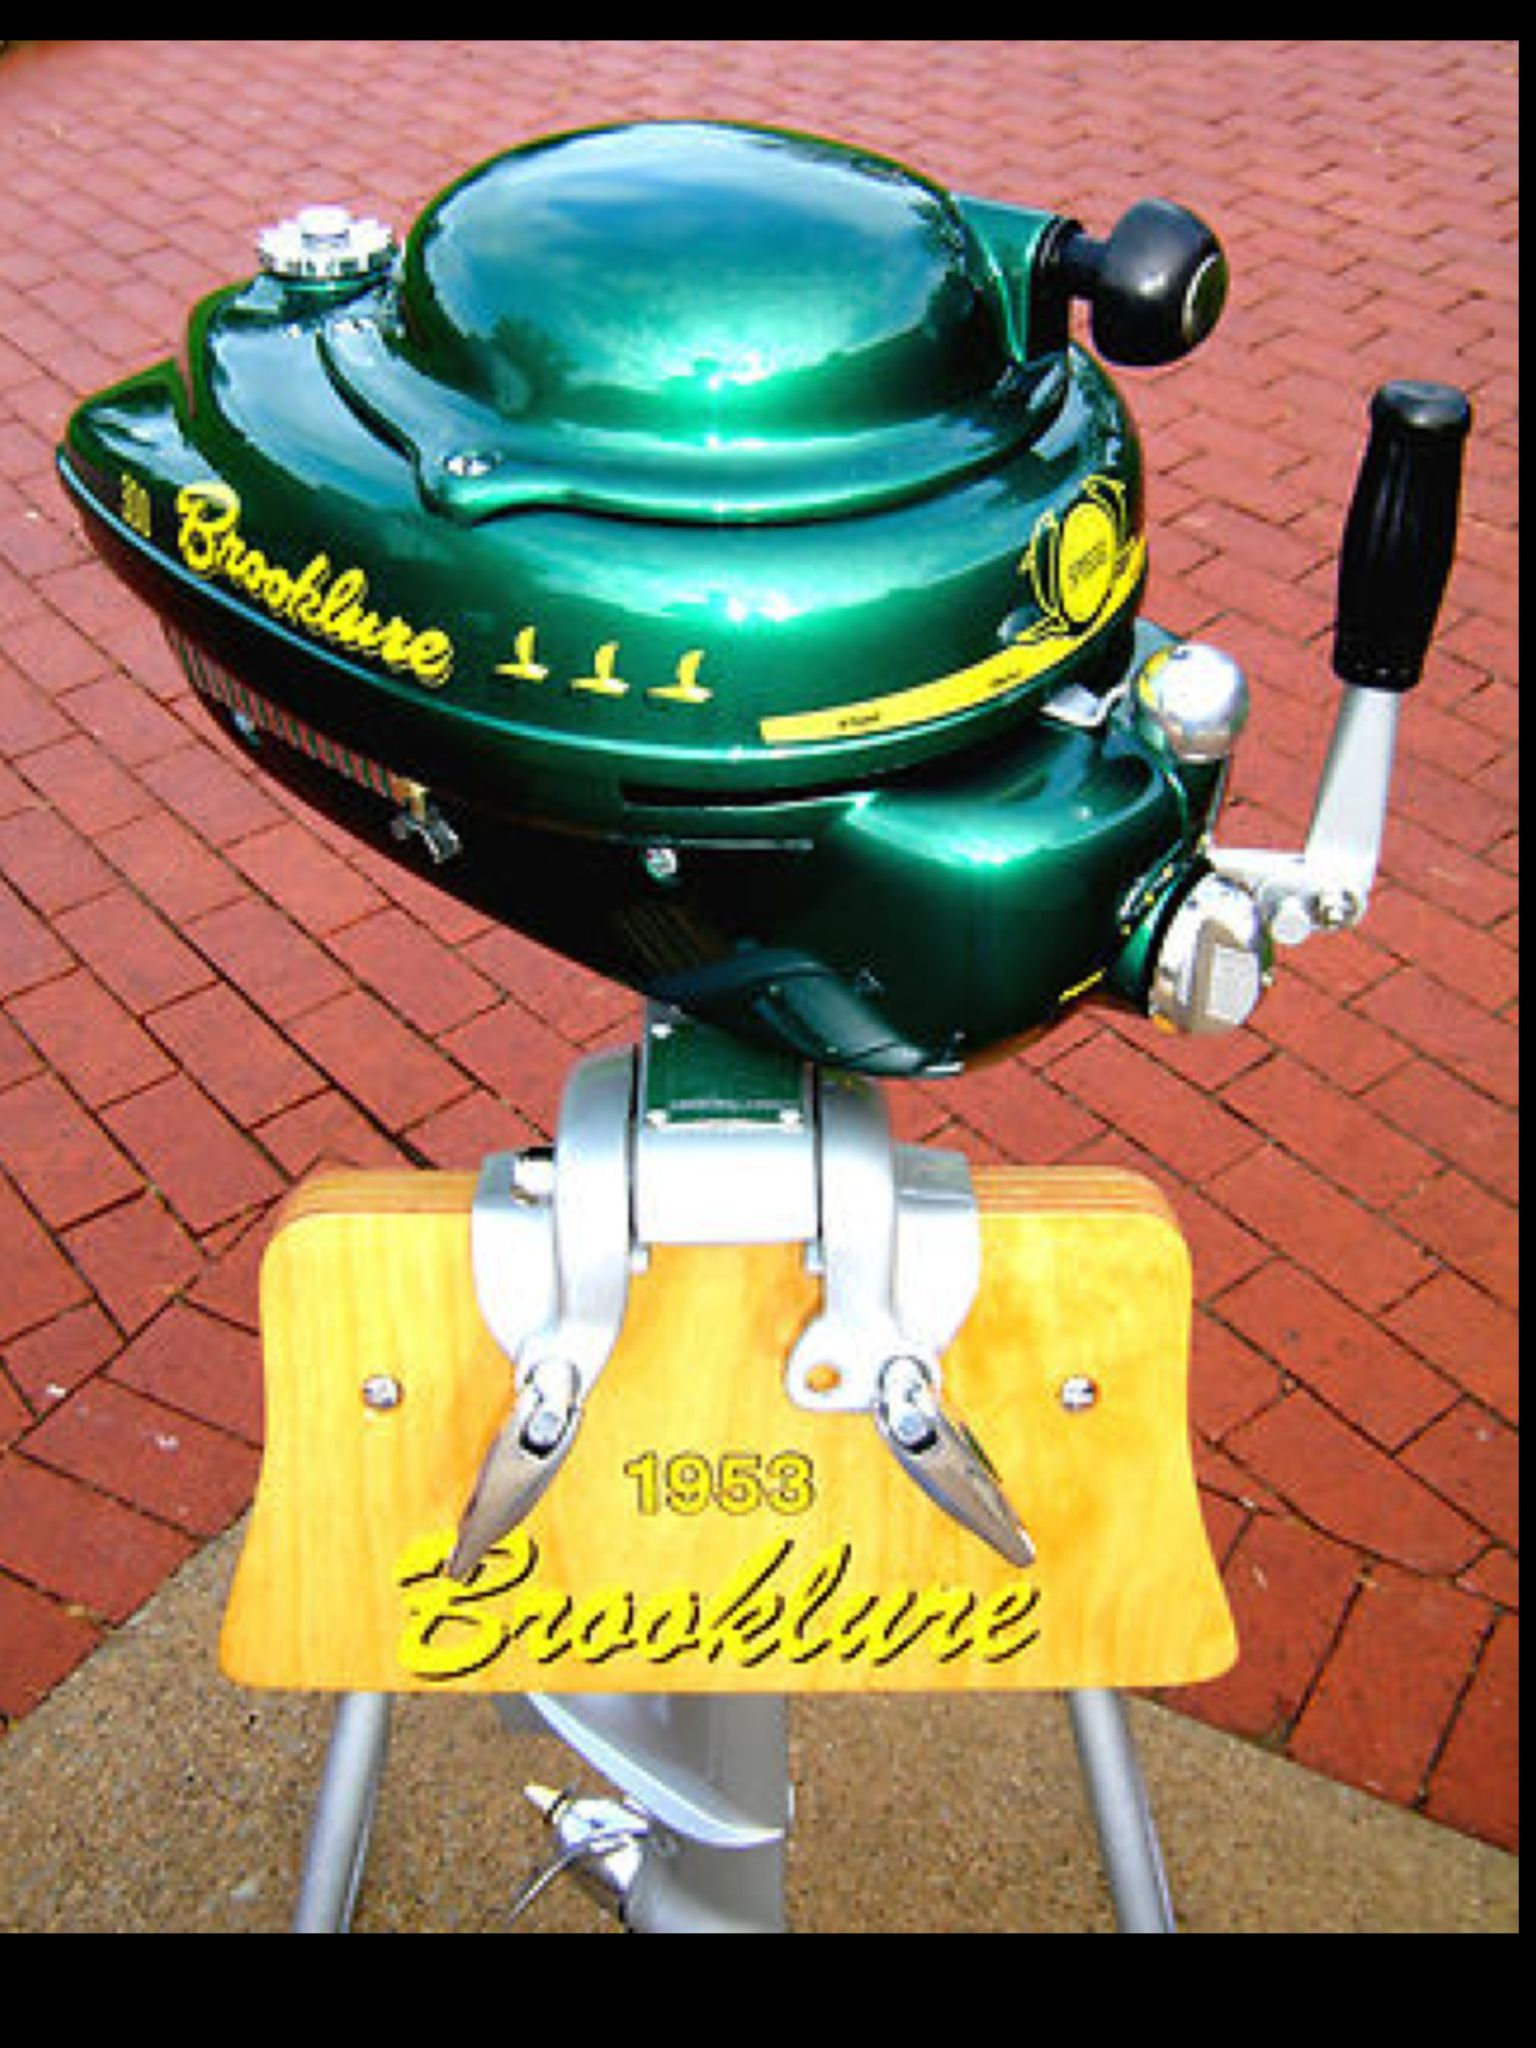 johnson outboard motor 1957 7 5 hp boat motors pinterest